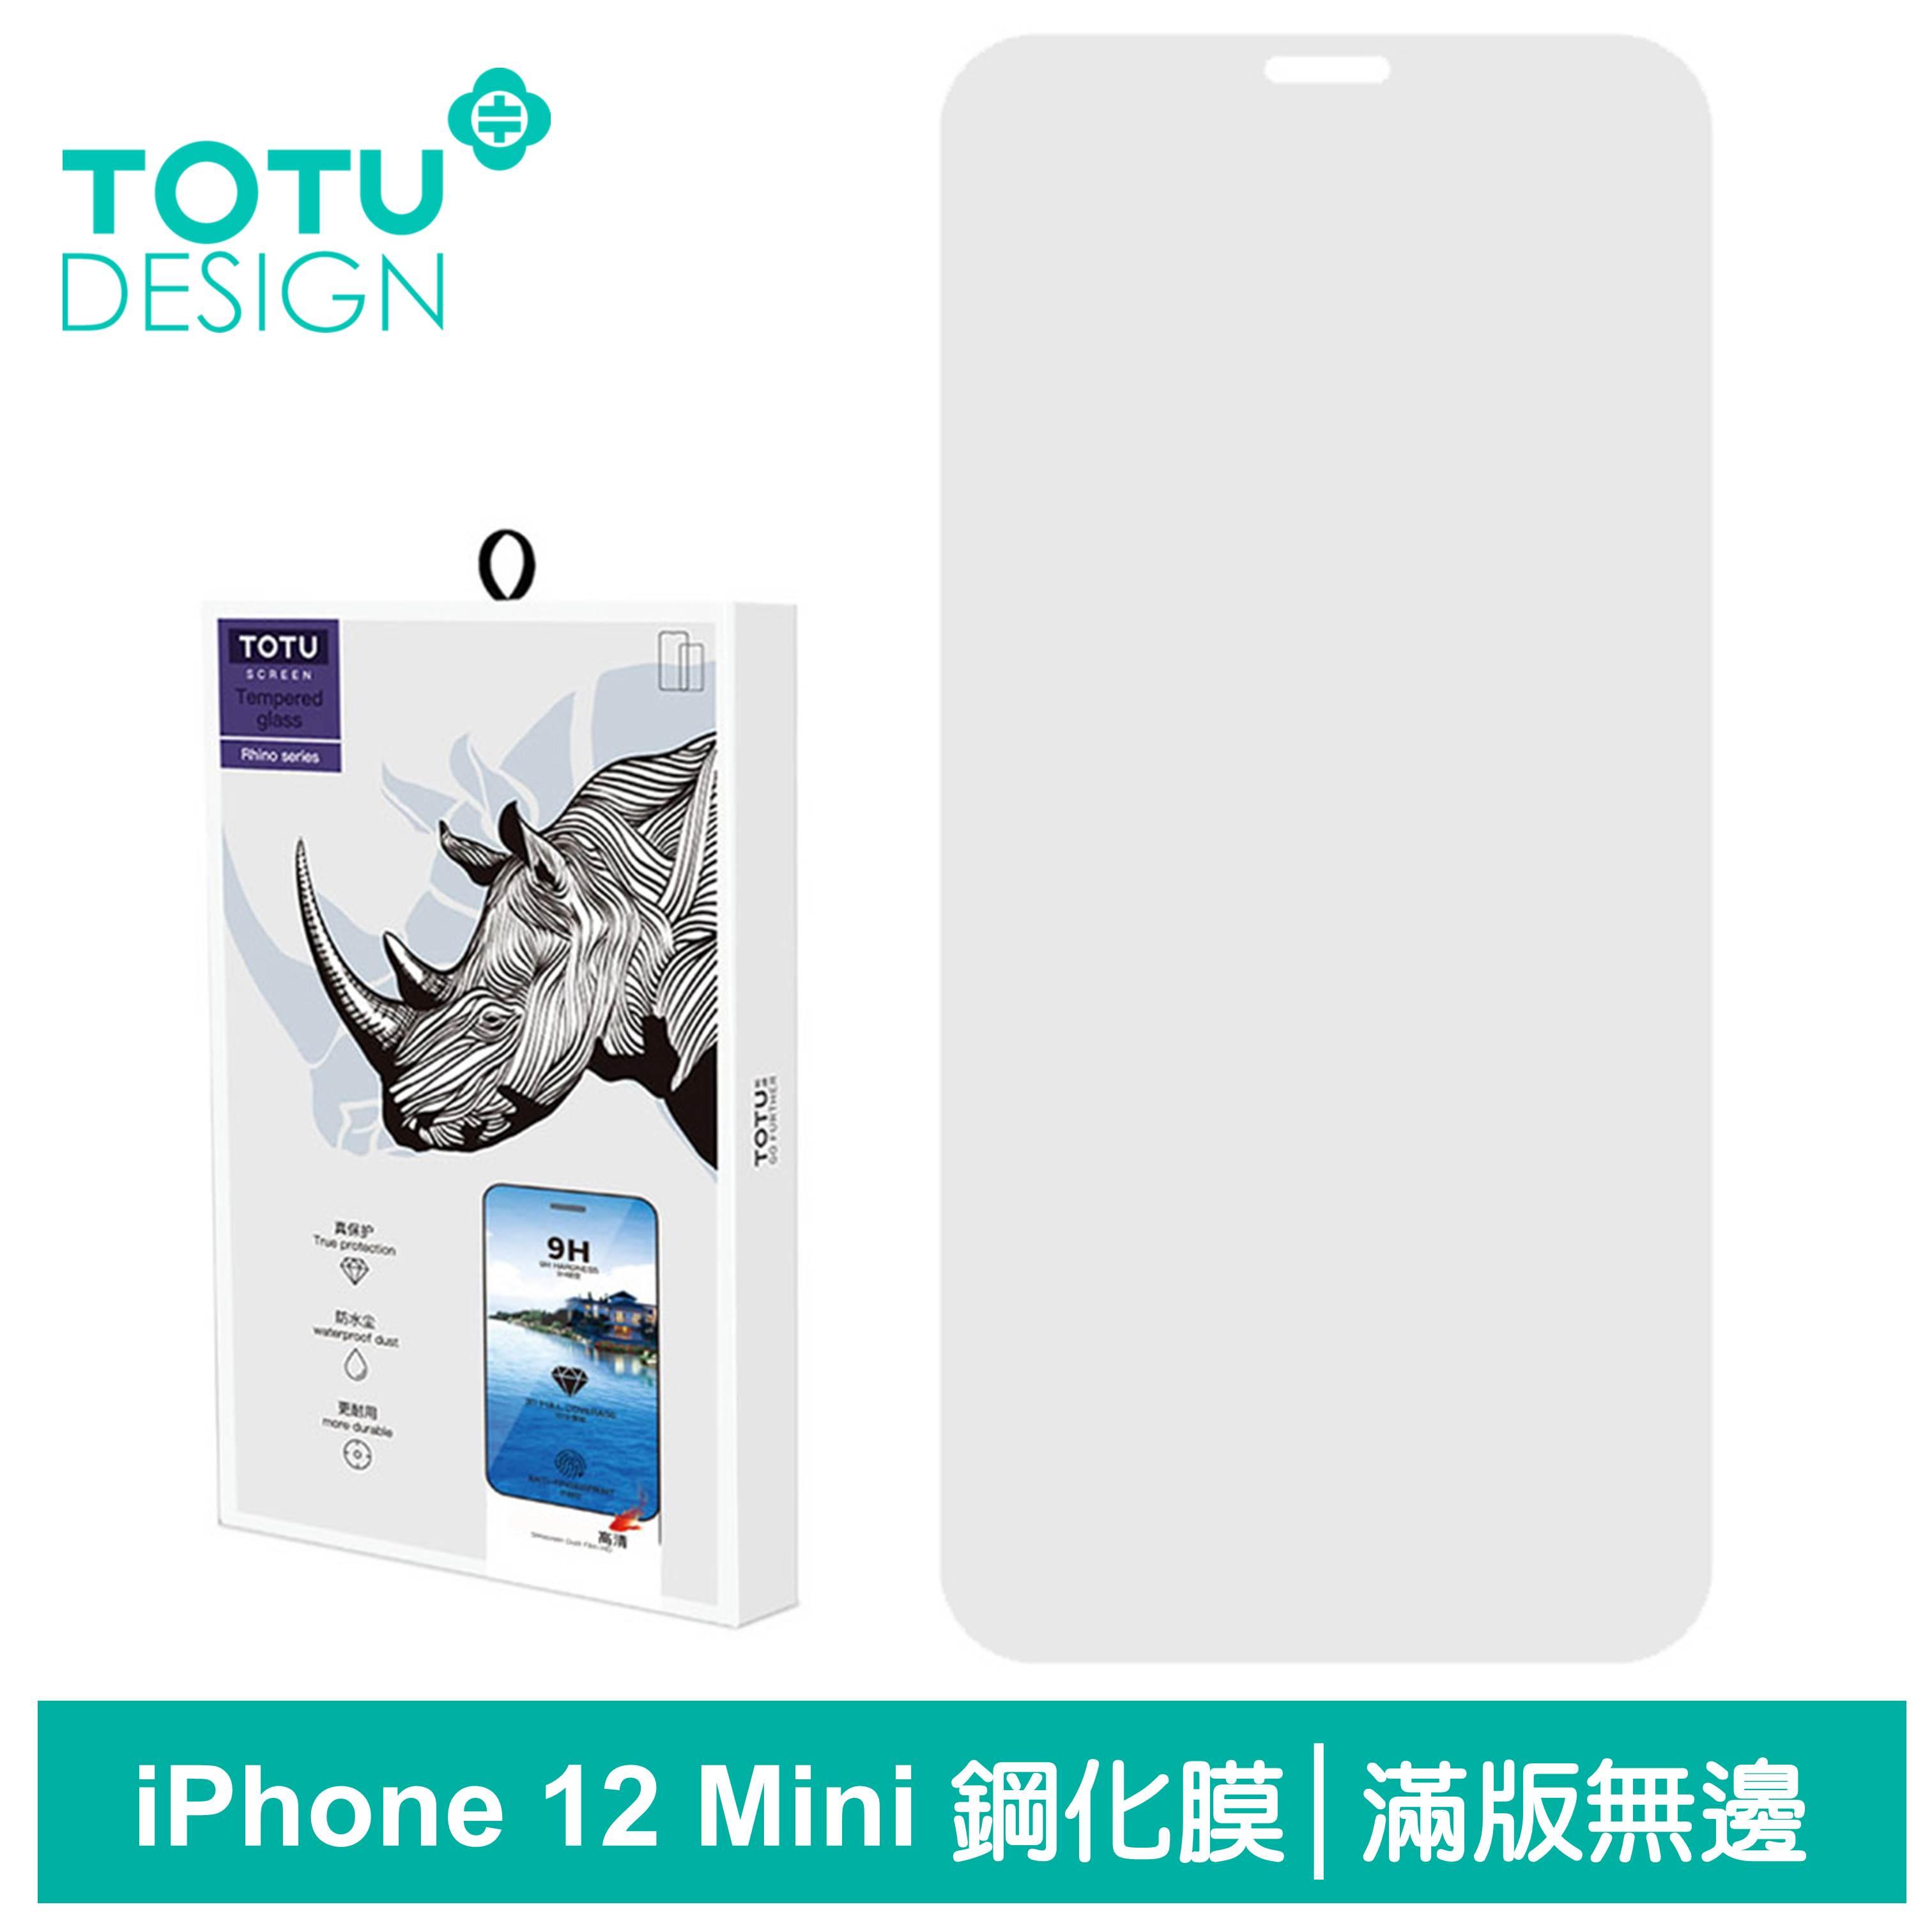 TOTU台灣官方 iPhone 12 Mini 鋼化膜 i12 Mini 保護貼 5.4吋 保護膜 滿版高清無邊 犀牛家族